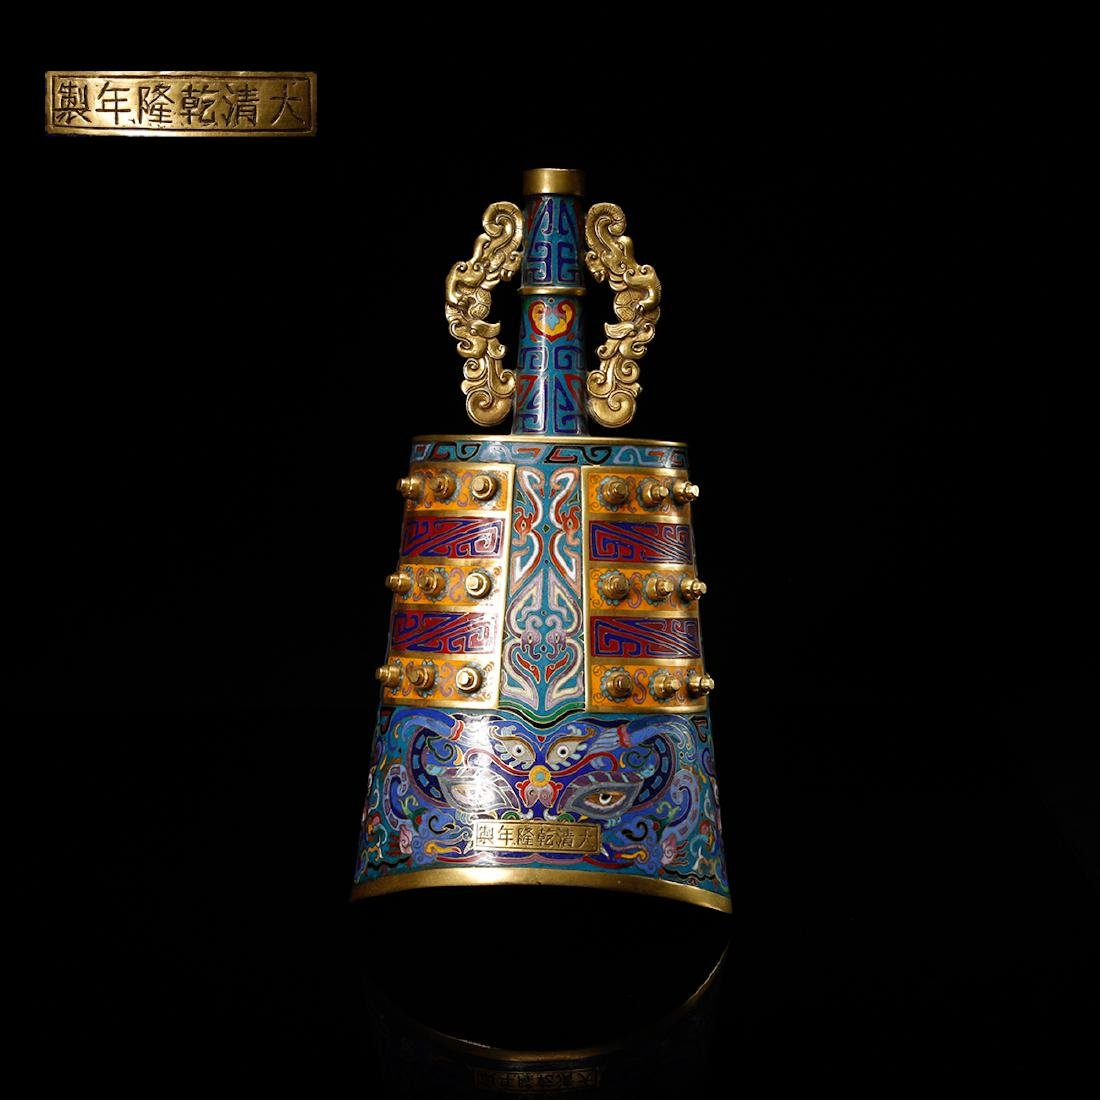 CHINESE CLOISONNE BELL, BIANZHONG